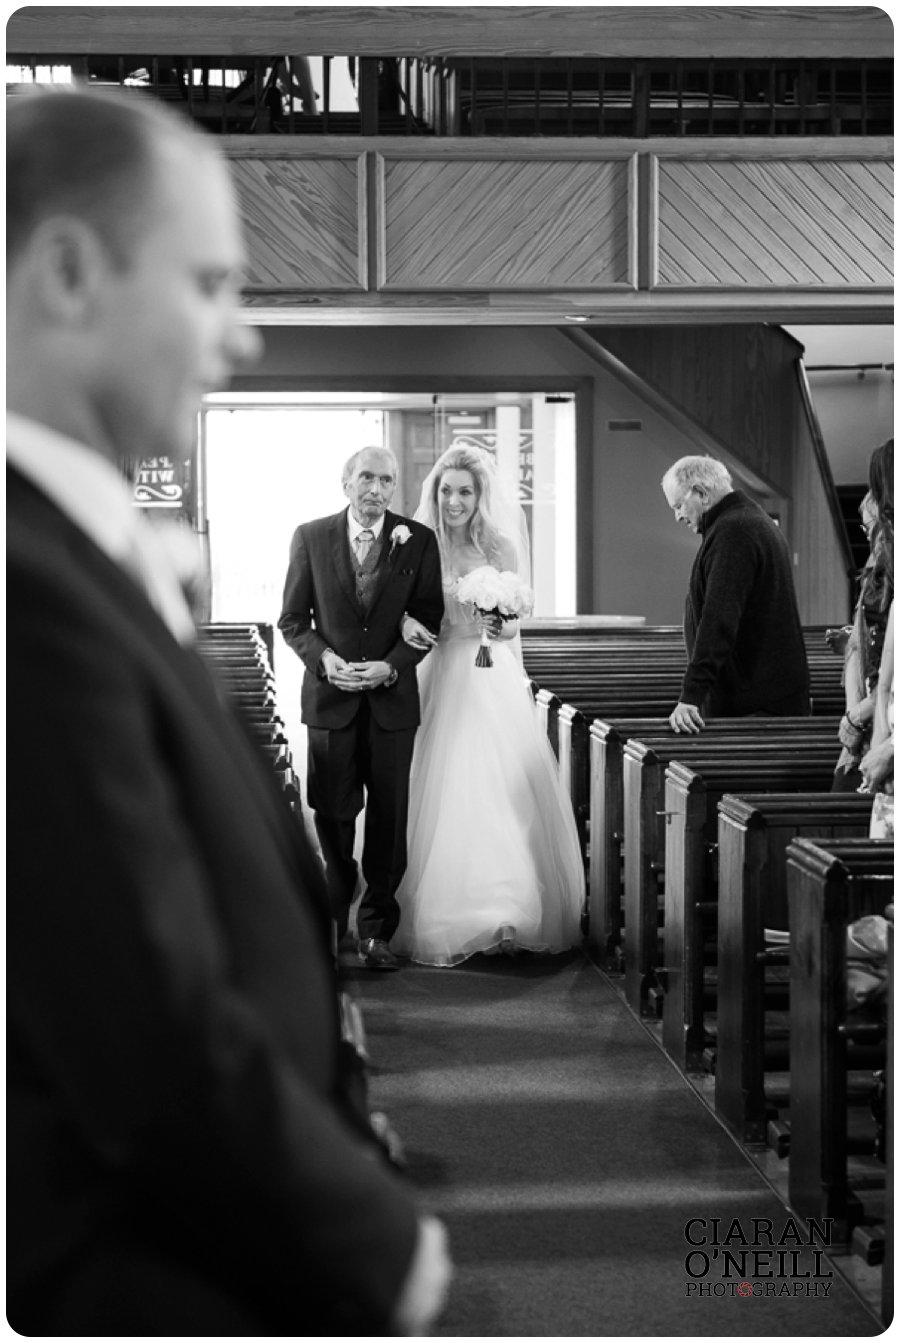 Linda & Jae's wedding at the Merchant Hotel by Ciaran O'Neill Photography 06